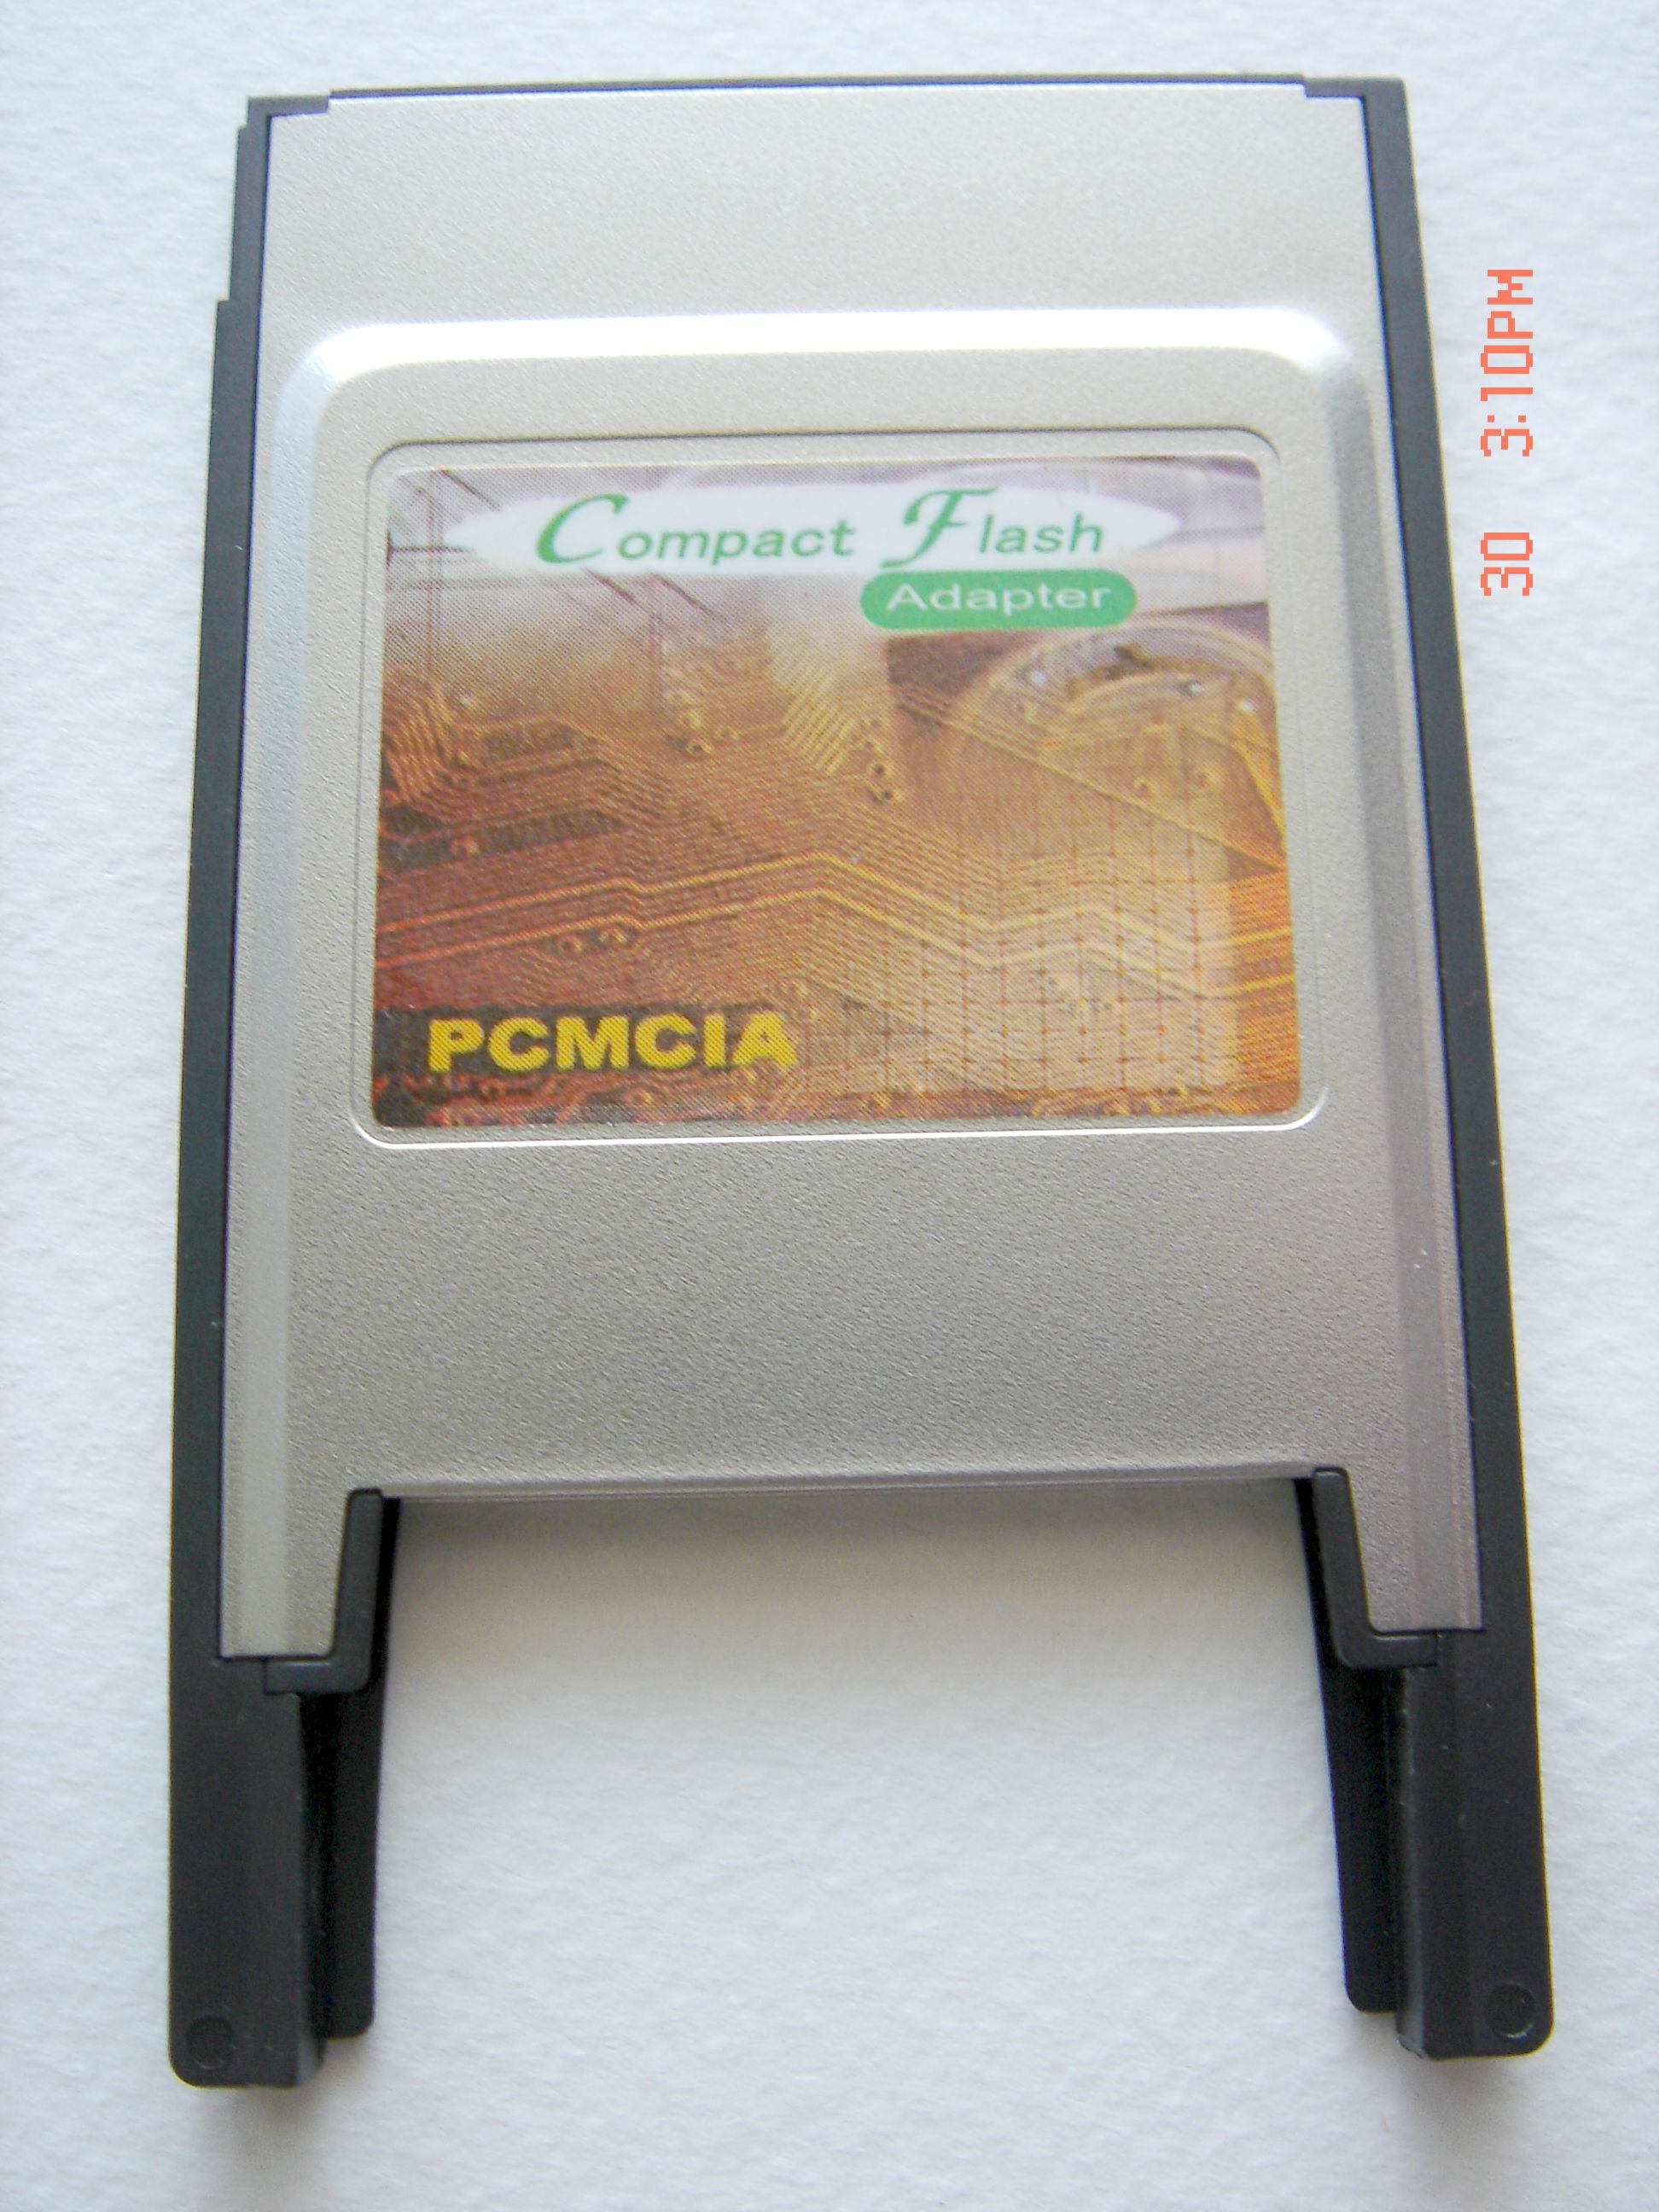 PCMCIA CF Memory Adapter (PCMCIA CF памяти видеоадаптера)